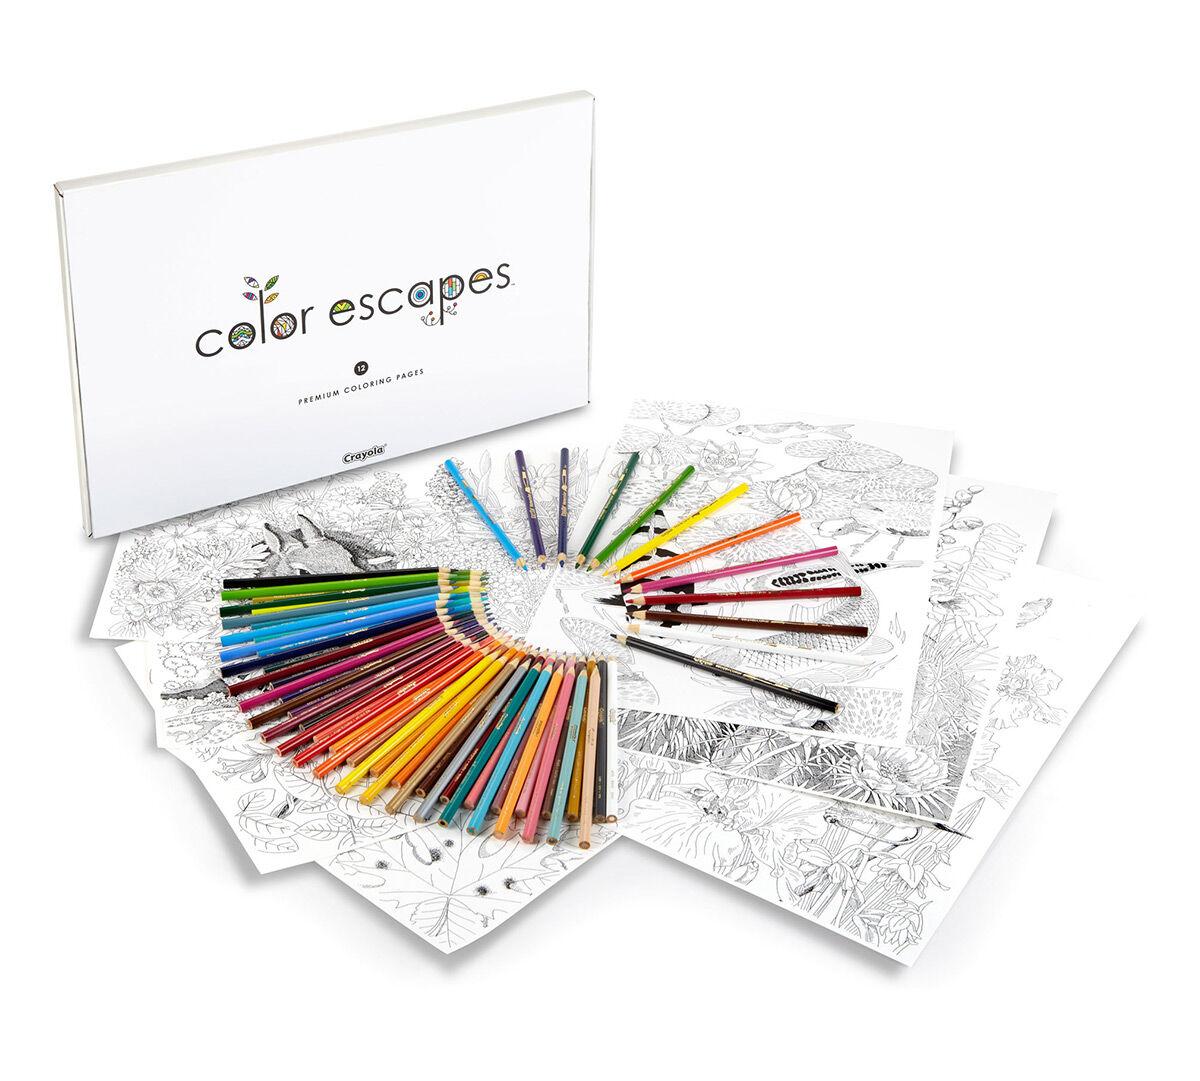 color escapes coloring kit garden crayola